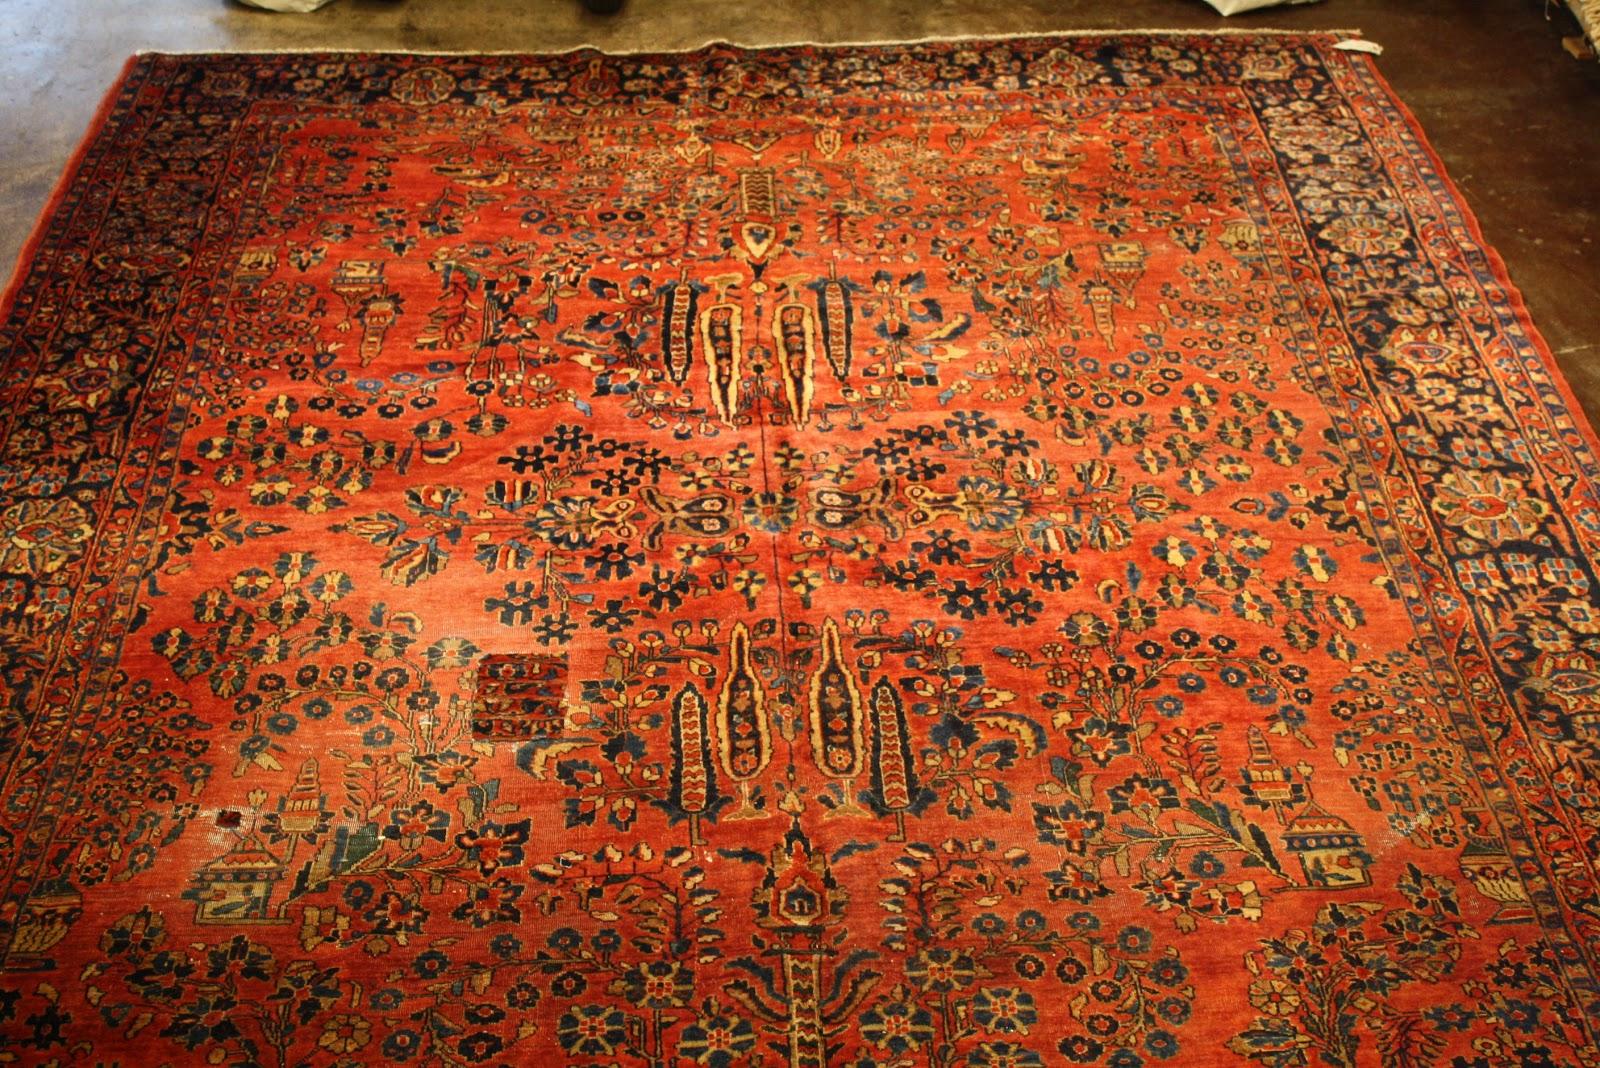 Persian Rug Cleaning In Orange County Carpet Vidalondon